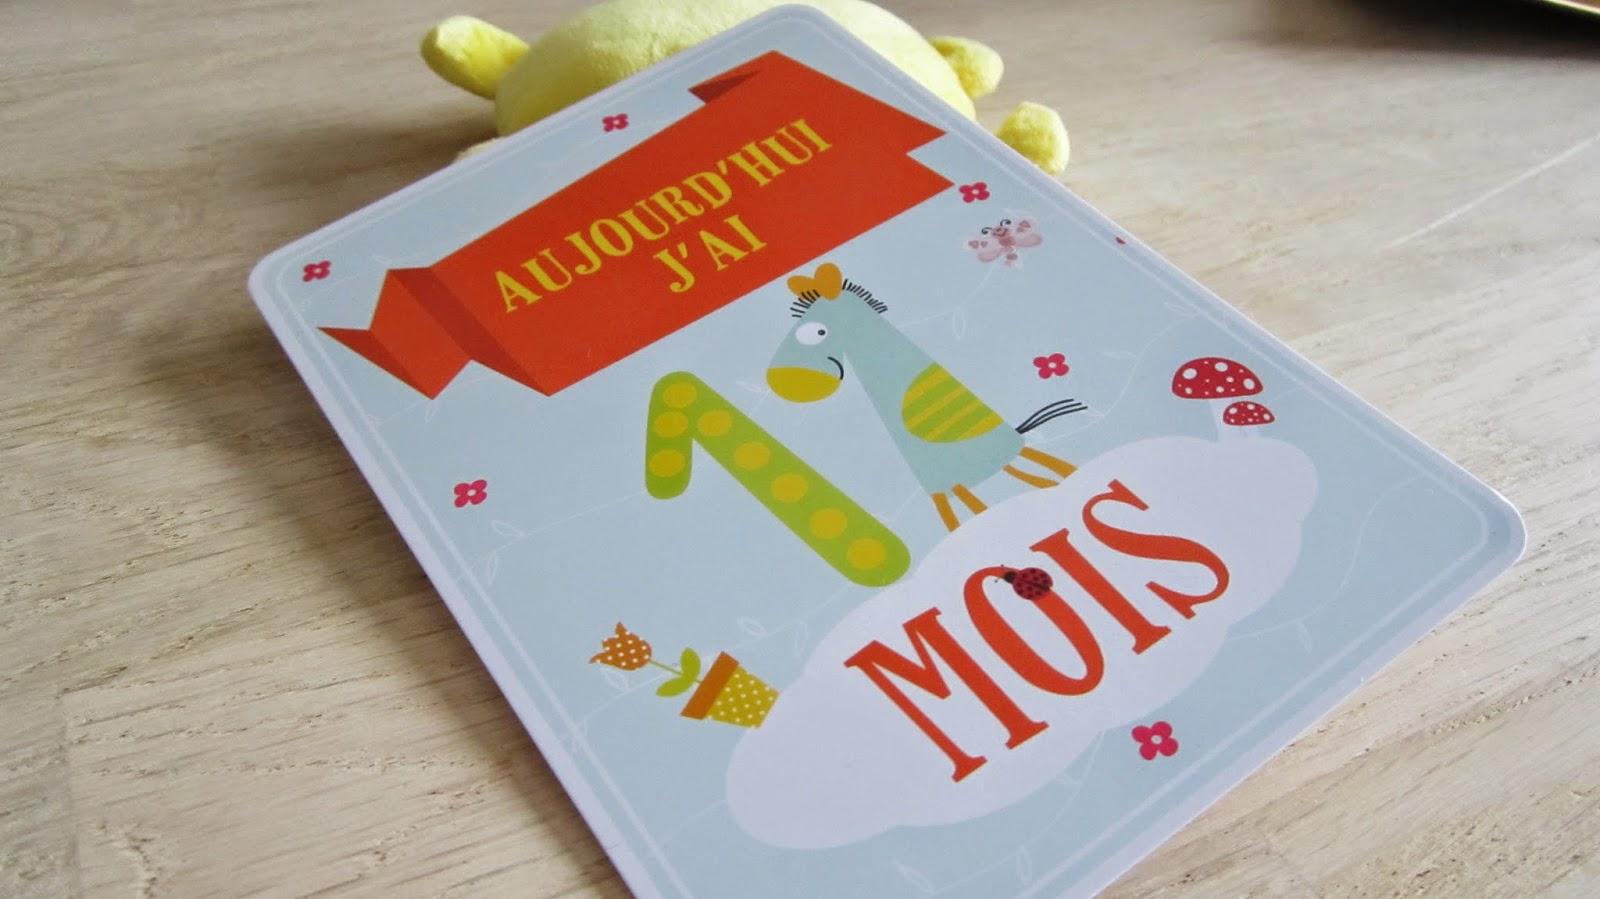 http://unegrenouilletouterose.blogspot.fr